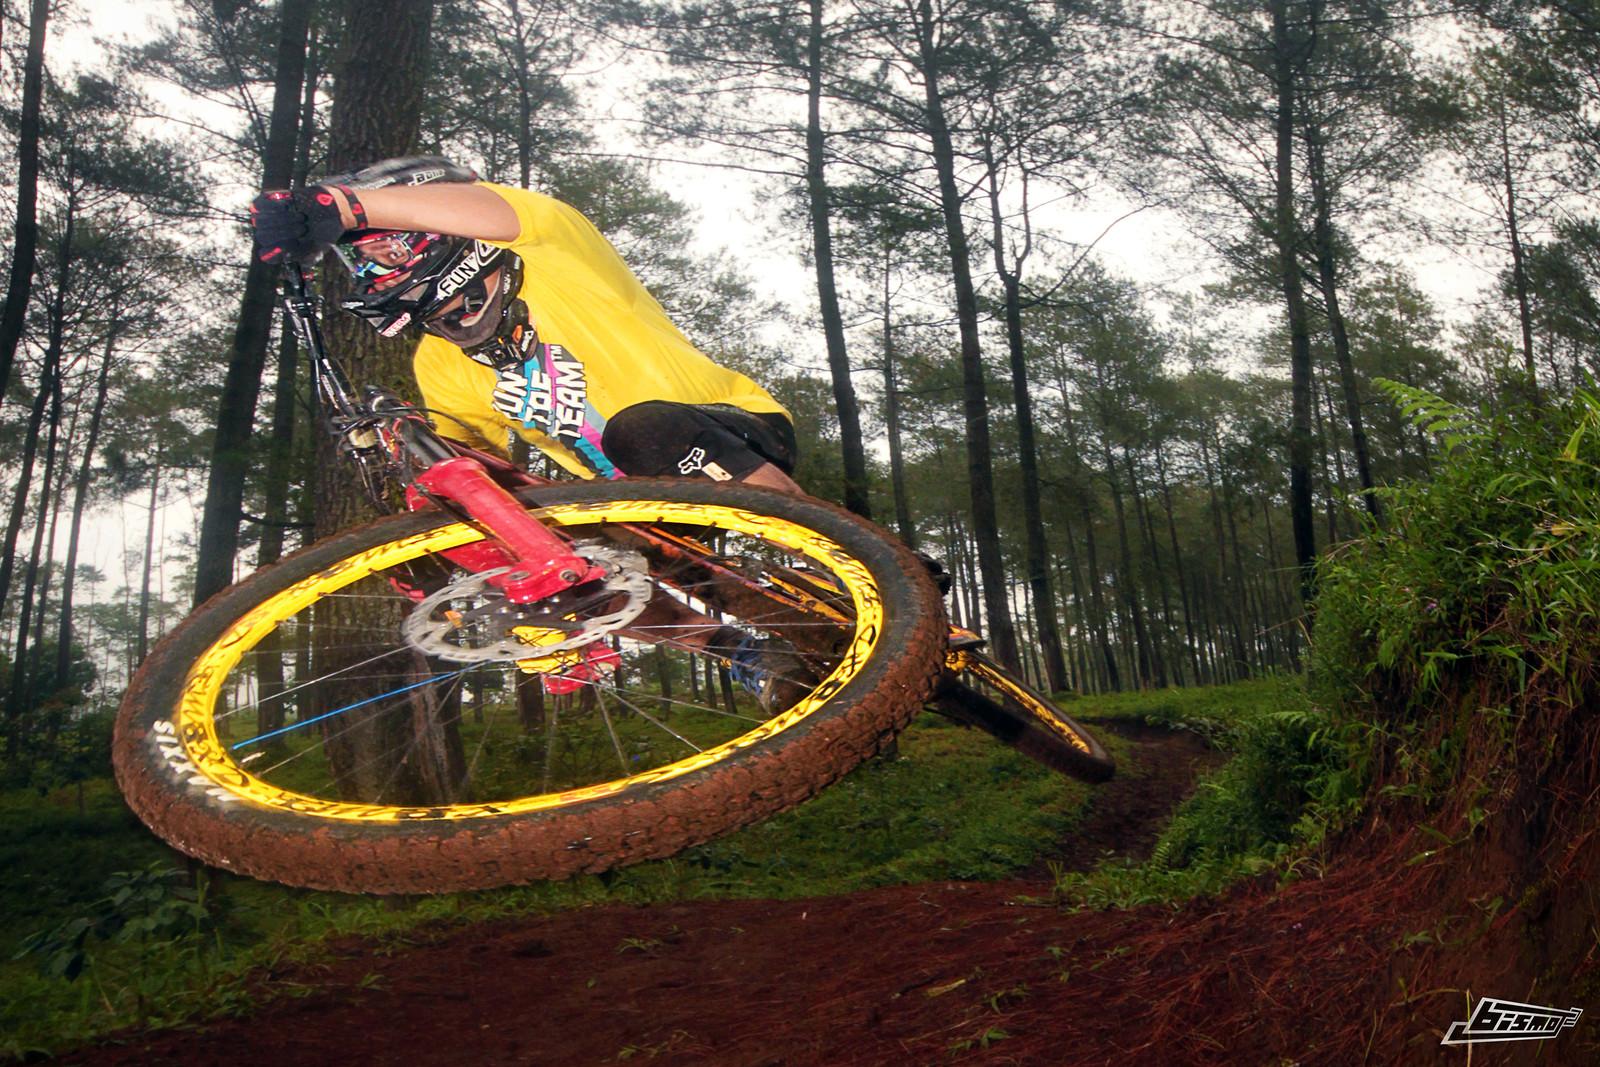 biz-scrubs-02MXX - bismojo - Mountain Biking Pictures - Vital MTB